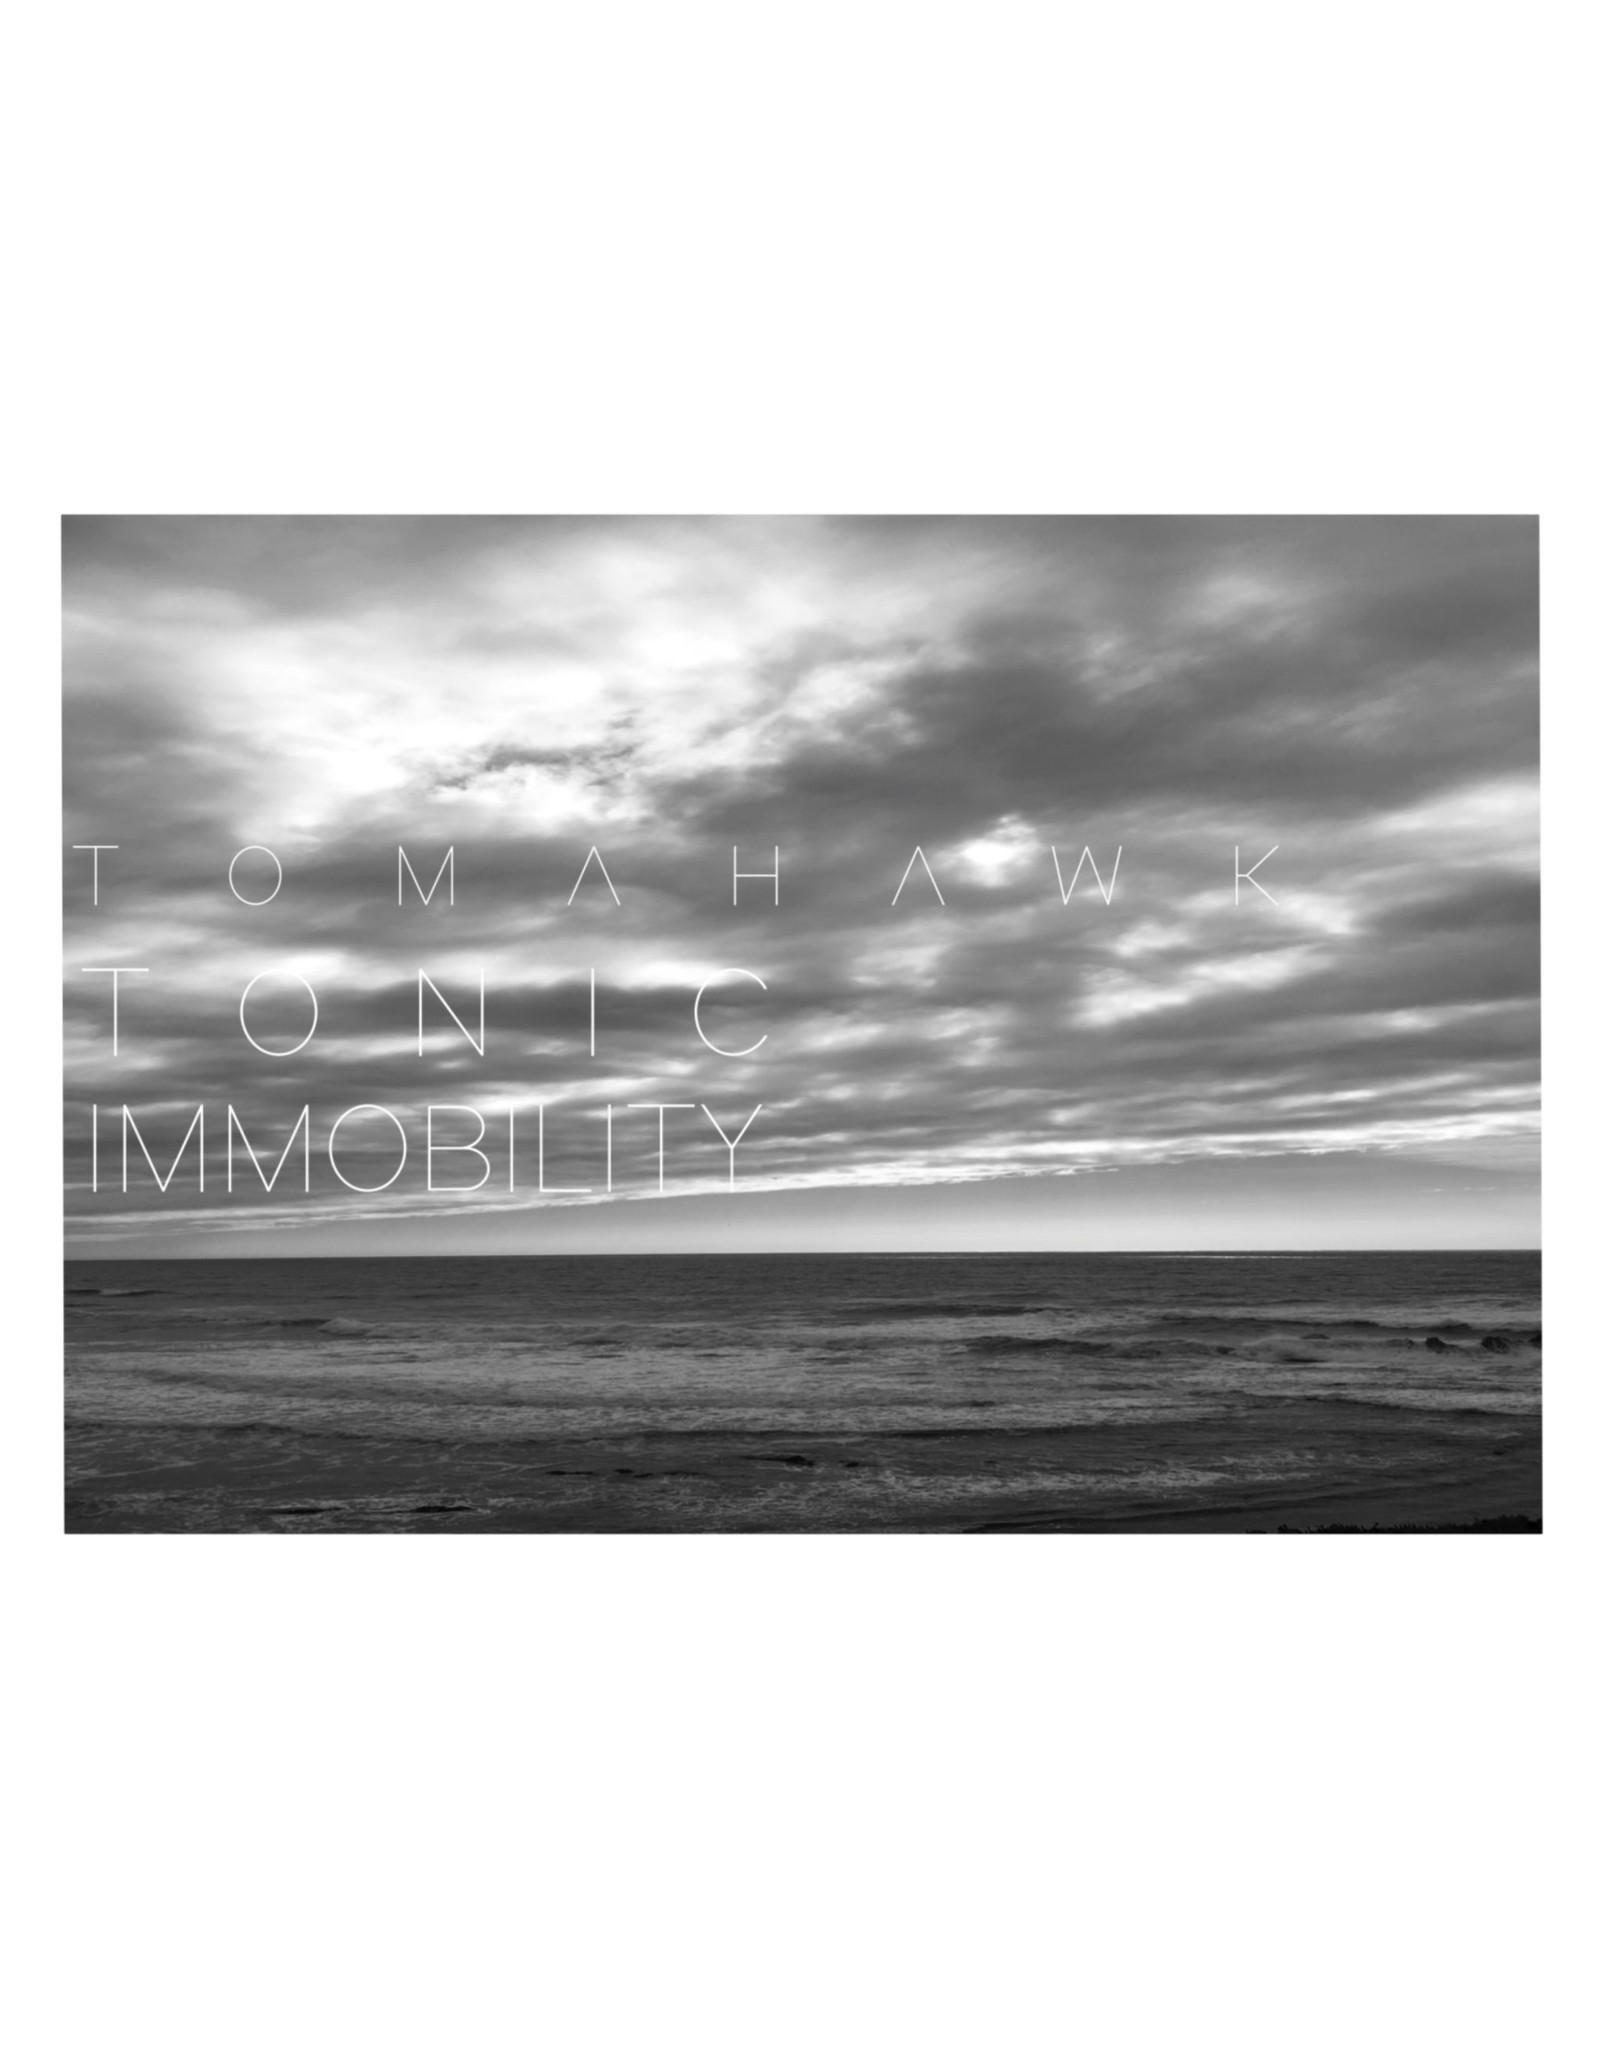 Tomahawk - Tonic Immobility LP